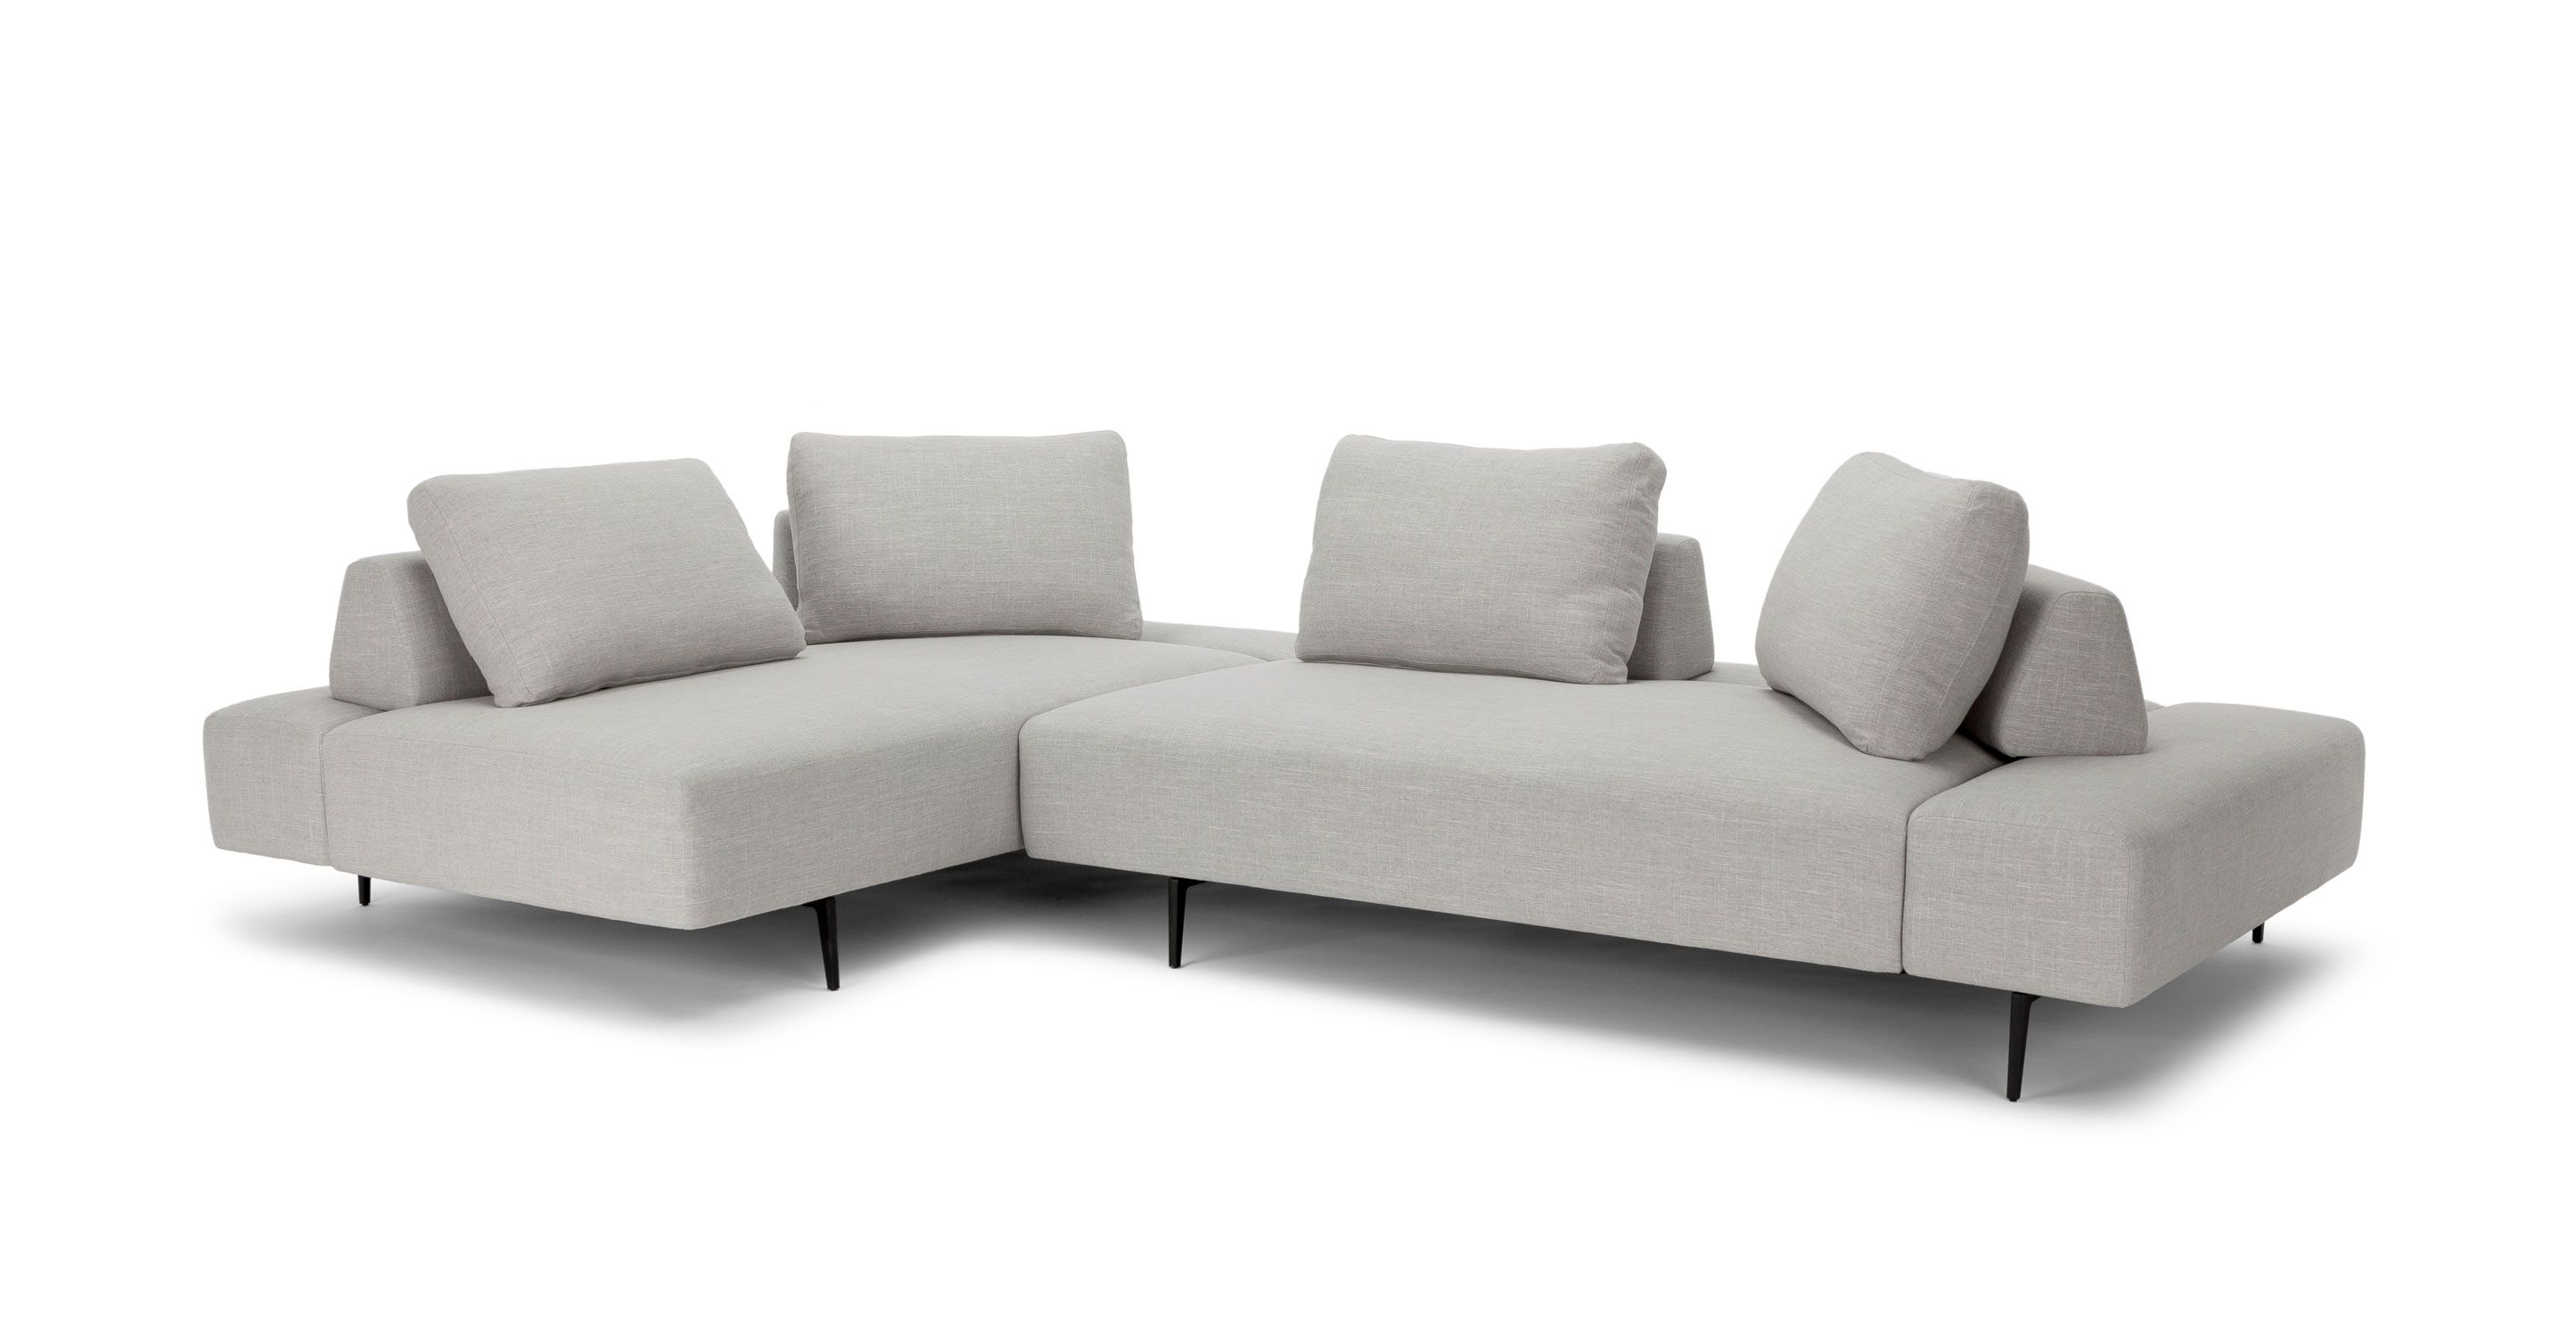 Best Divan Mist Gray Sectional Grey Sectional Sectional Sofa 400 x 300